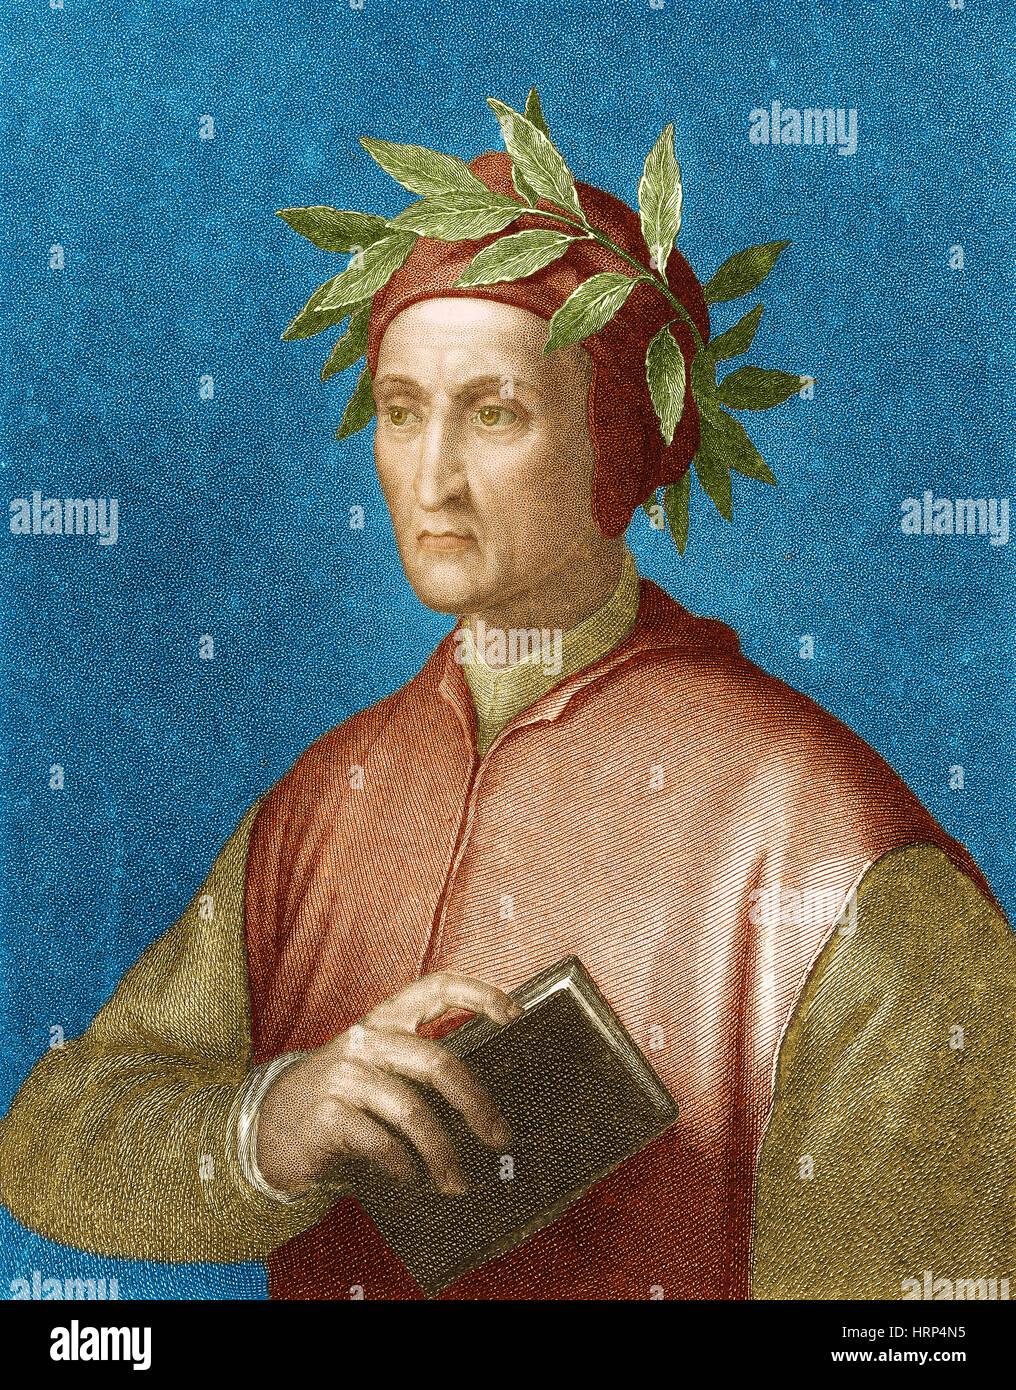 Dante Alighieri frases